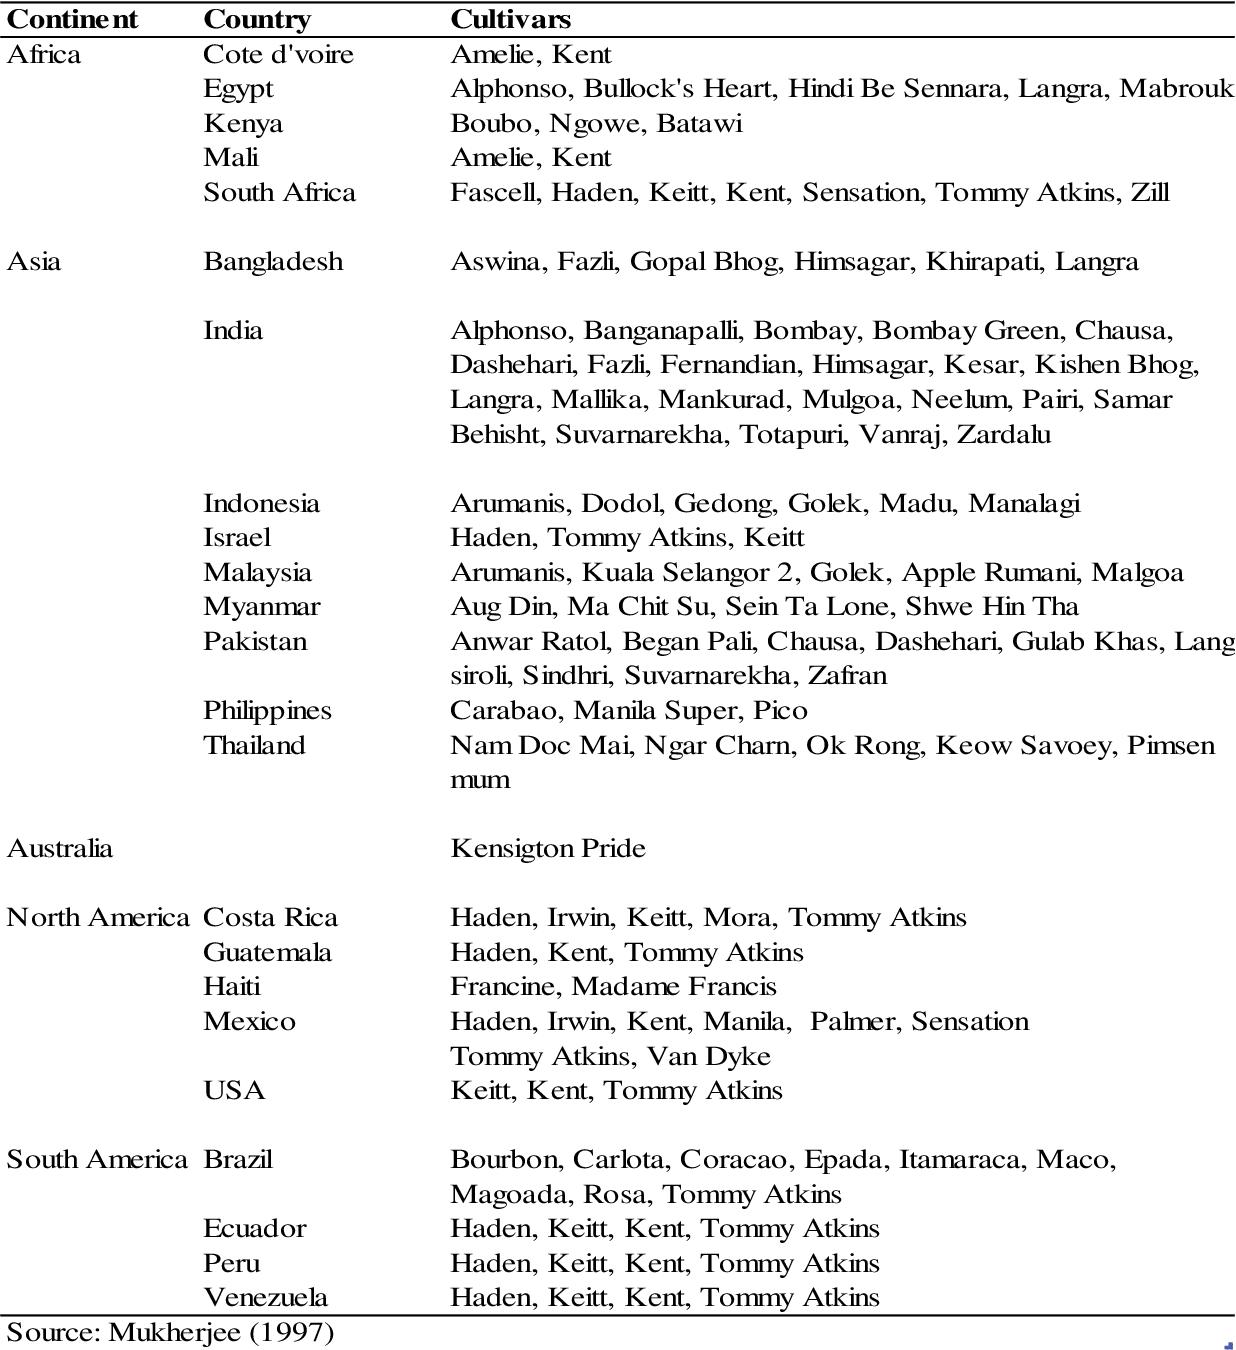 PDF] Morphological and genetic characterisation of mango